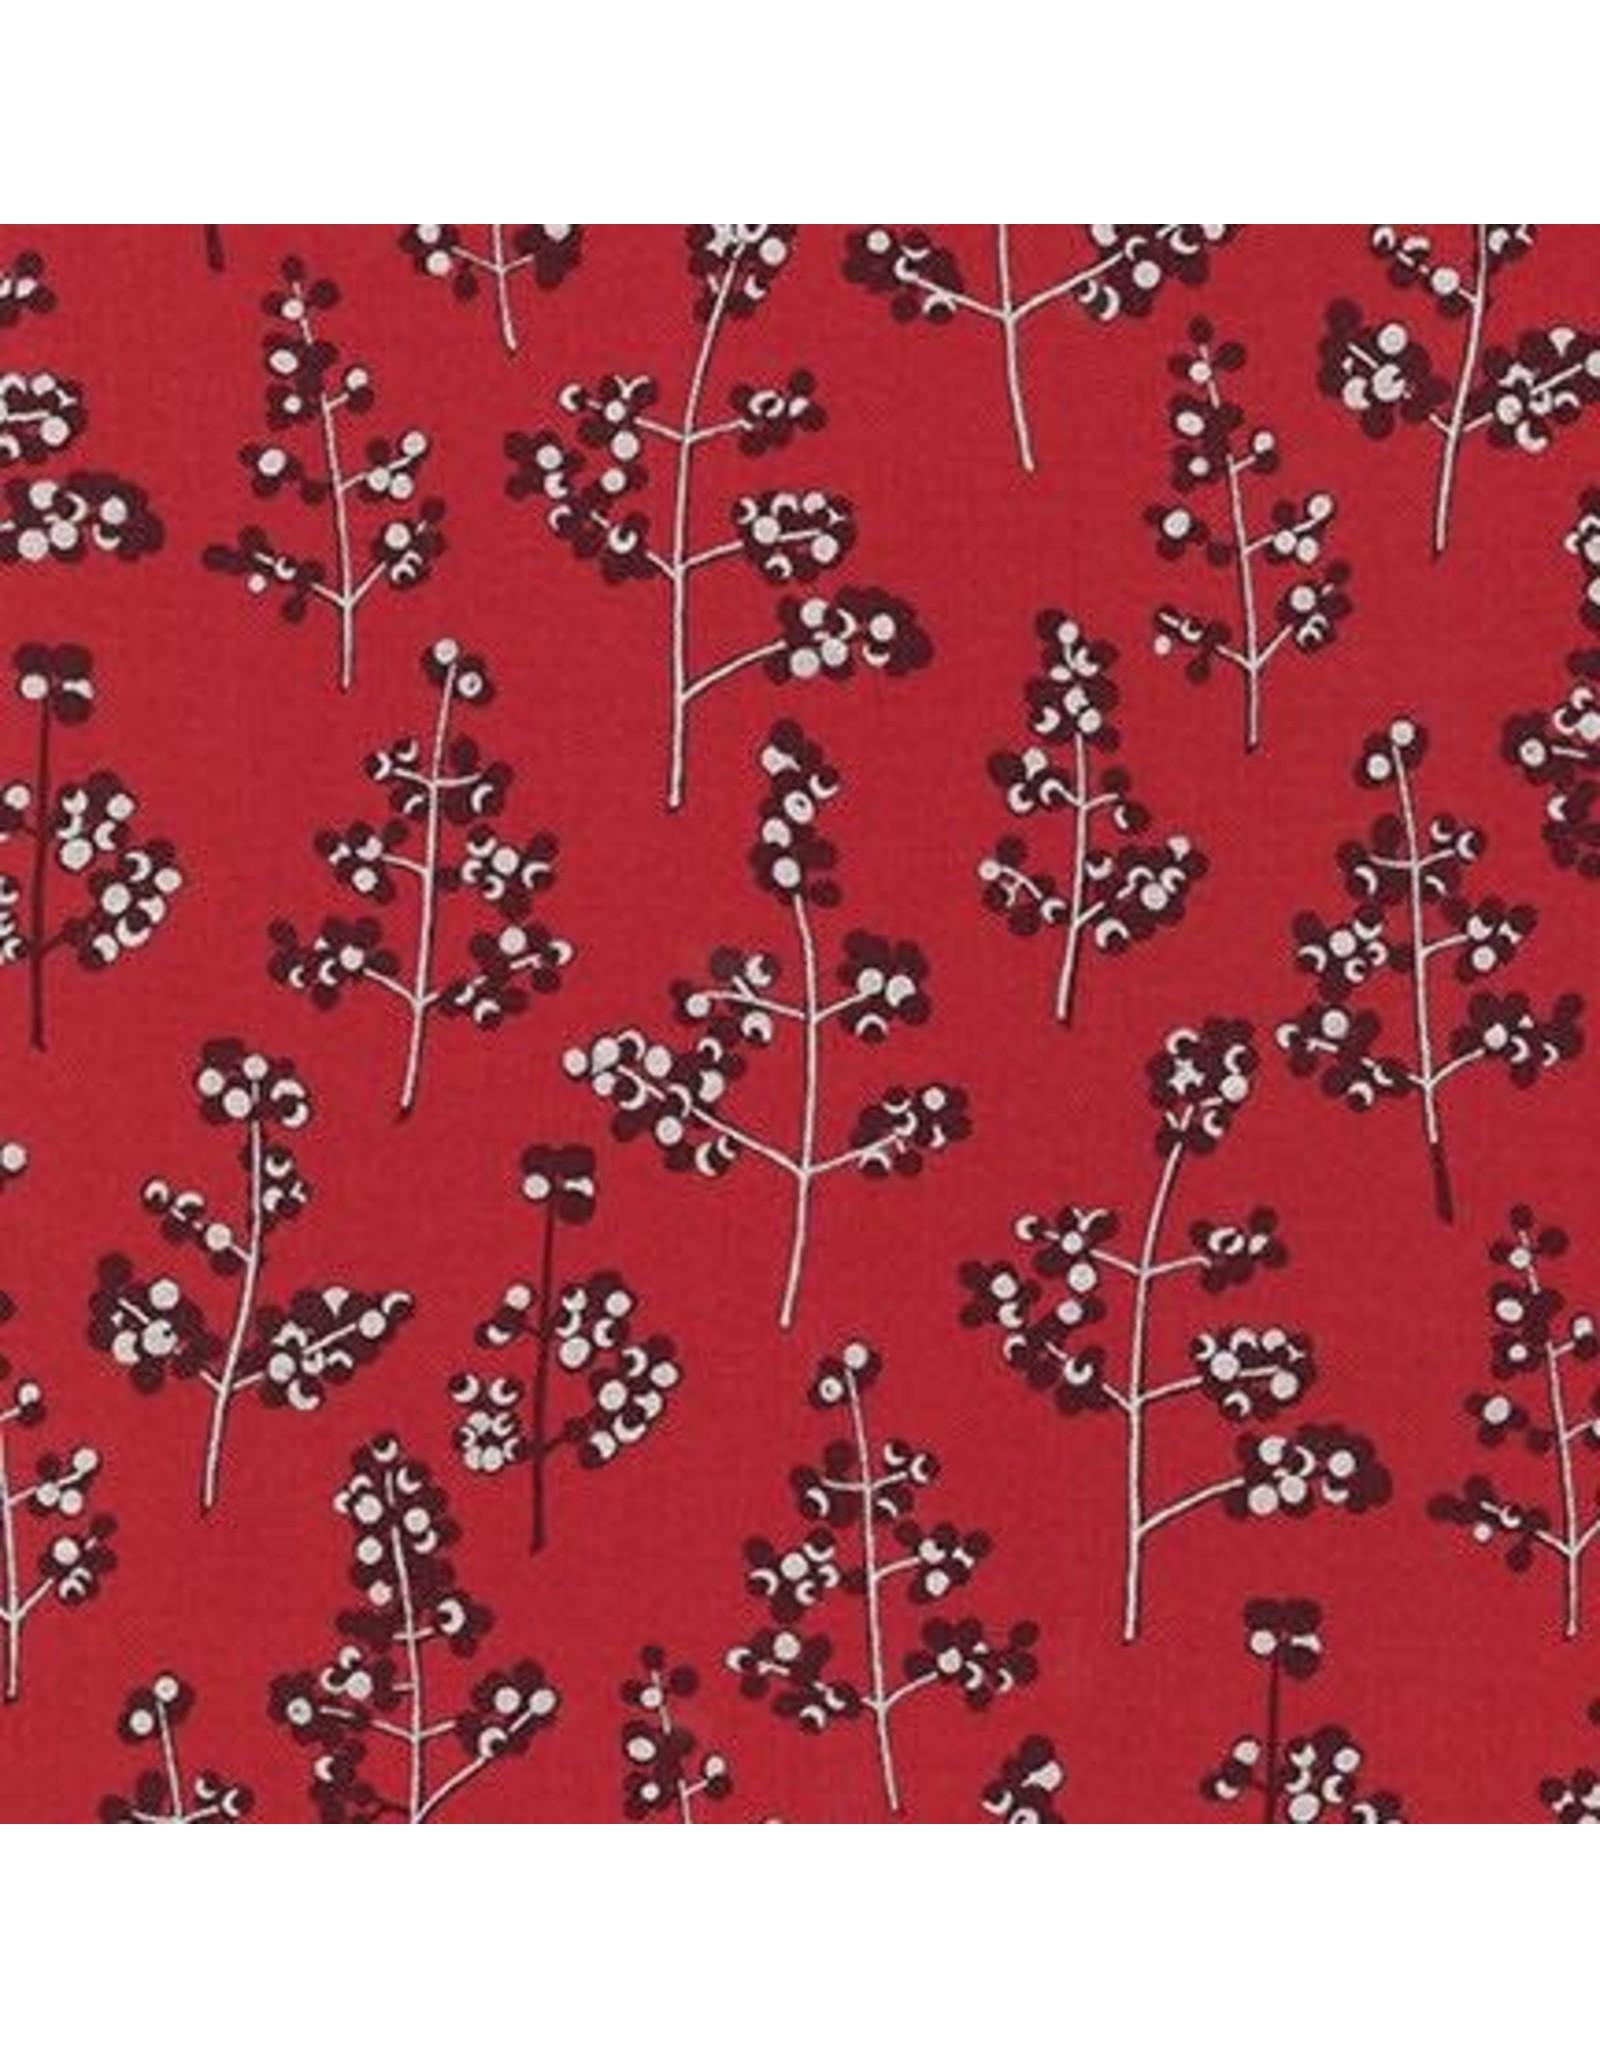 Jennifer Sampou Winter Shimmer 2, Holly Berry in Crimson, Fabric Half-Yards AJSP-19945-91